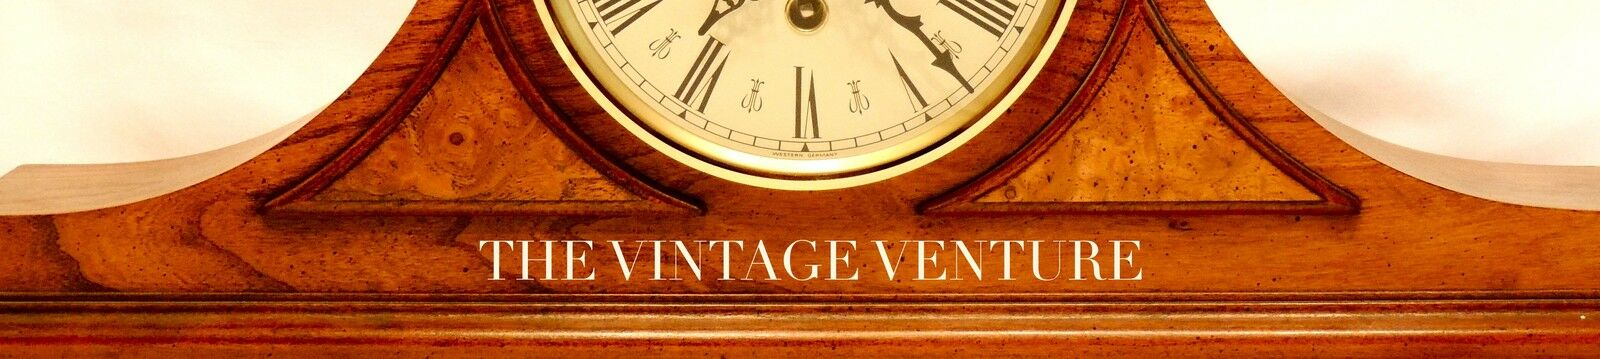 The Vintage Venture